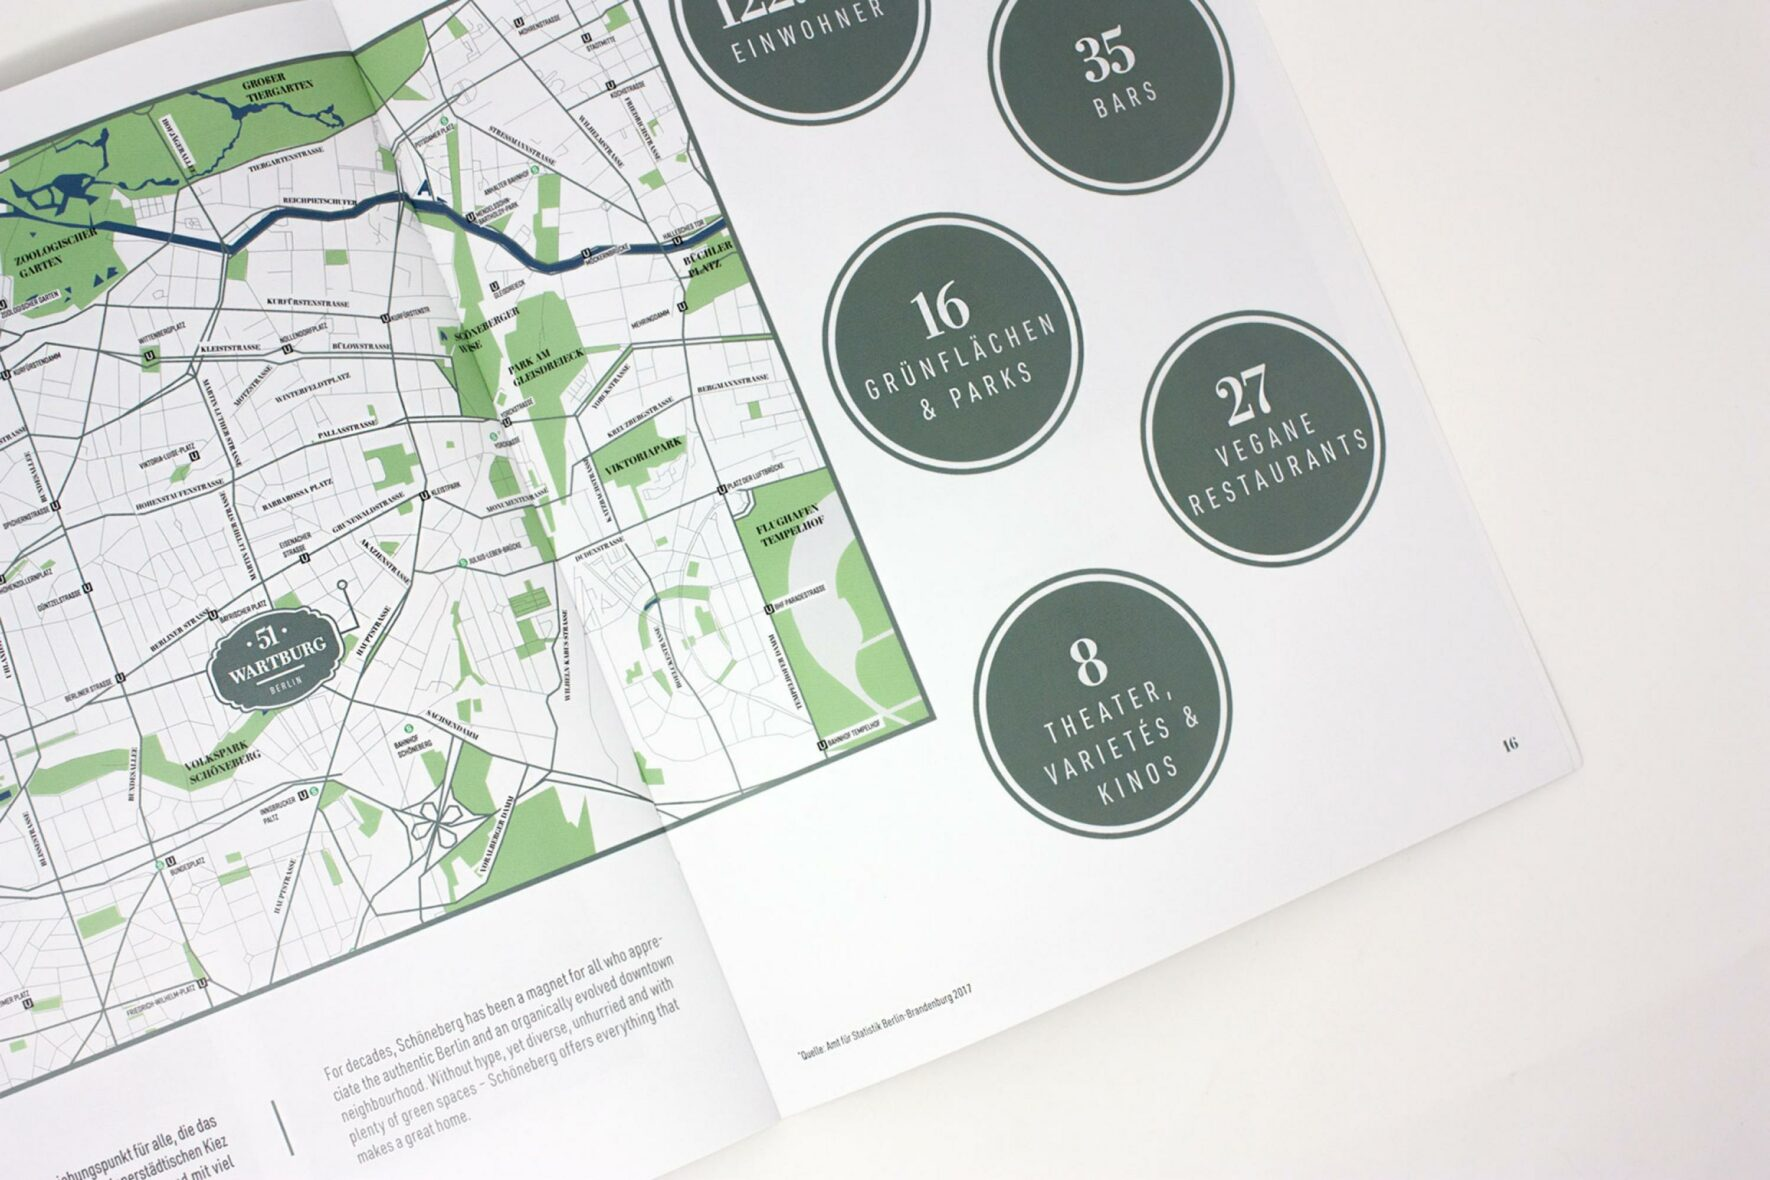 Immobilienbranding-wartburg-Trendcity-Broschüre-FORMLOS-berlin_MG_8312